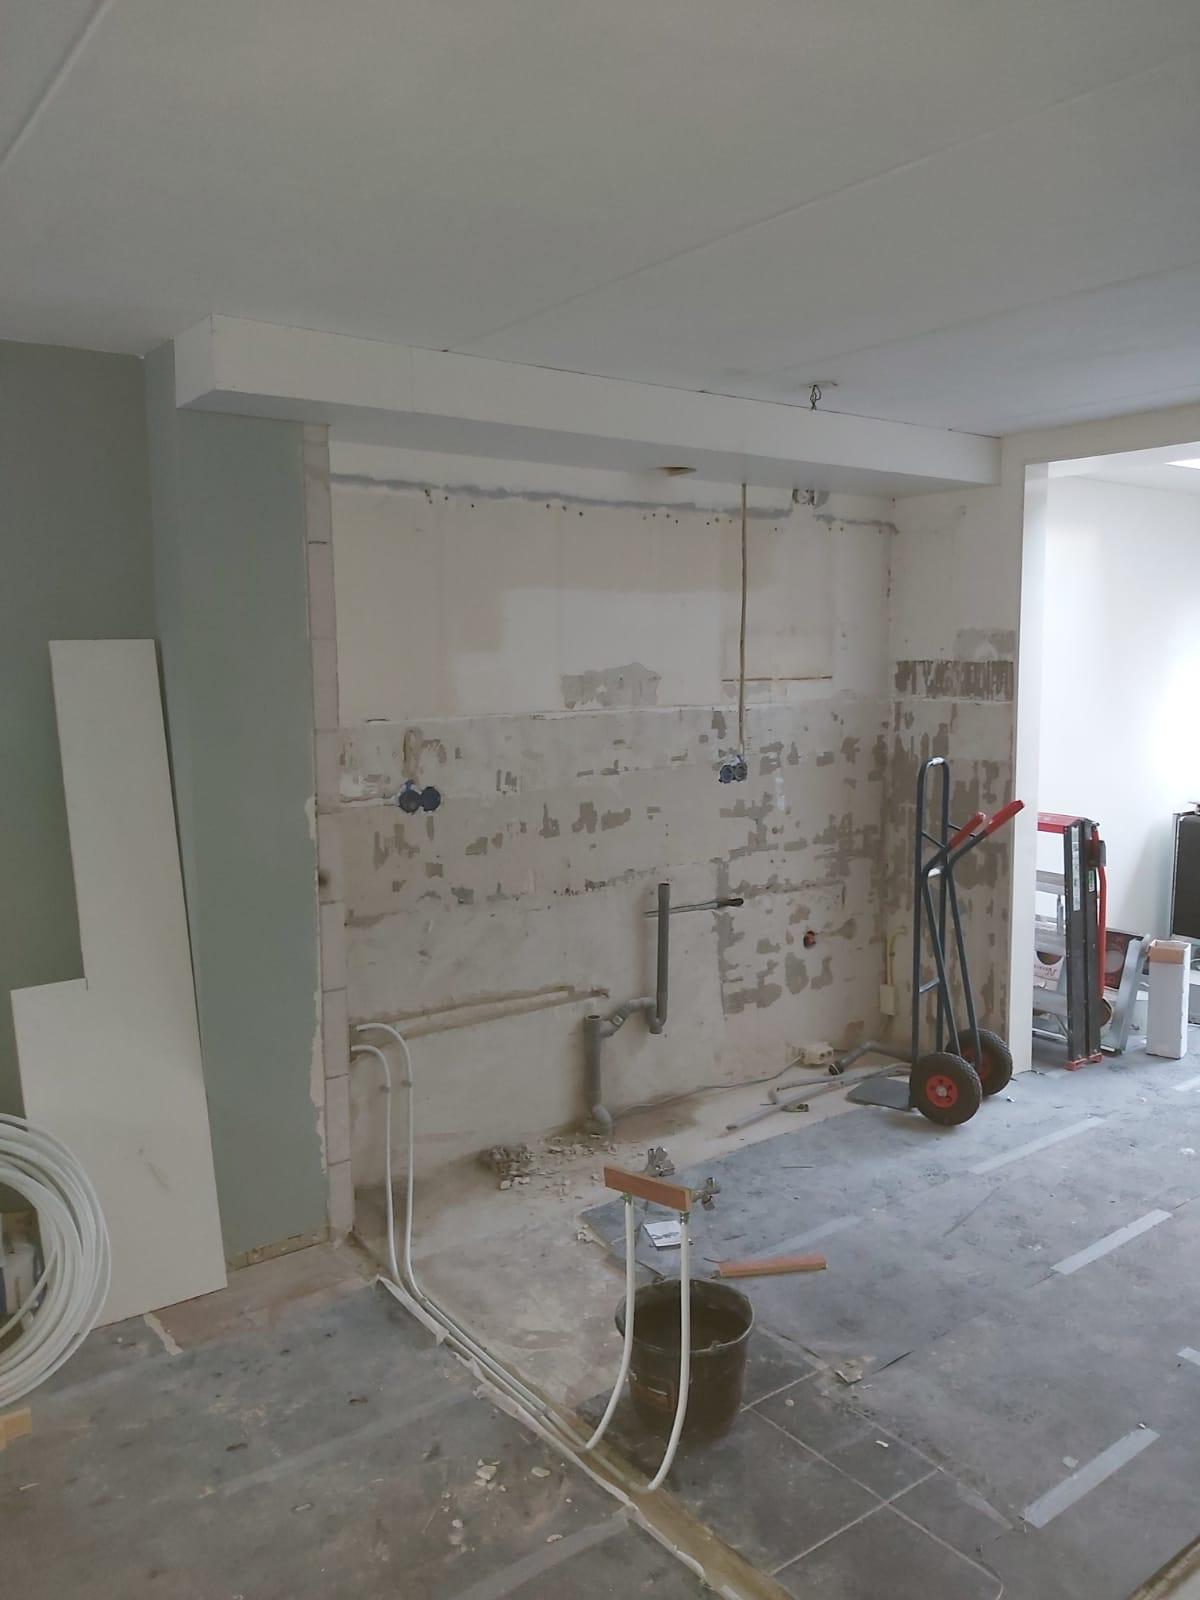 Installatiewerk - keuken & eiland